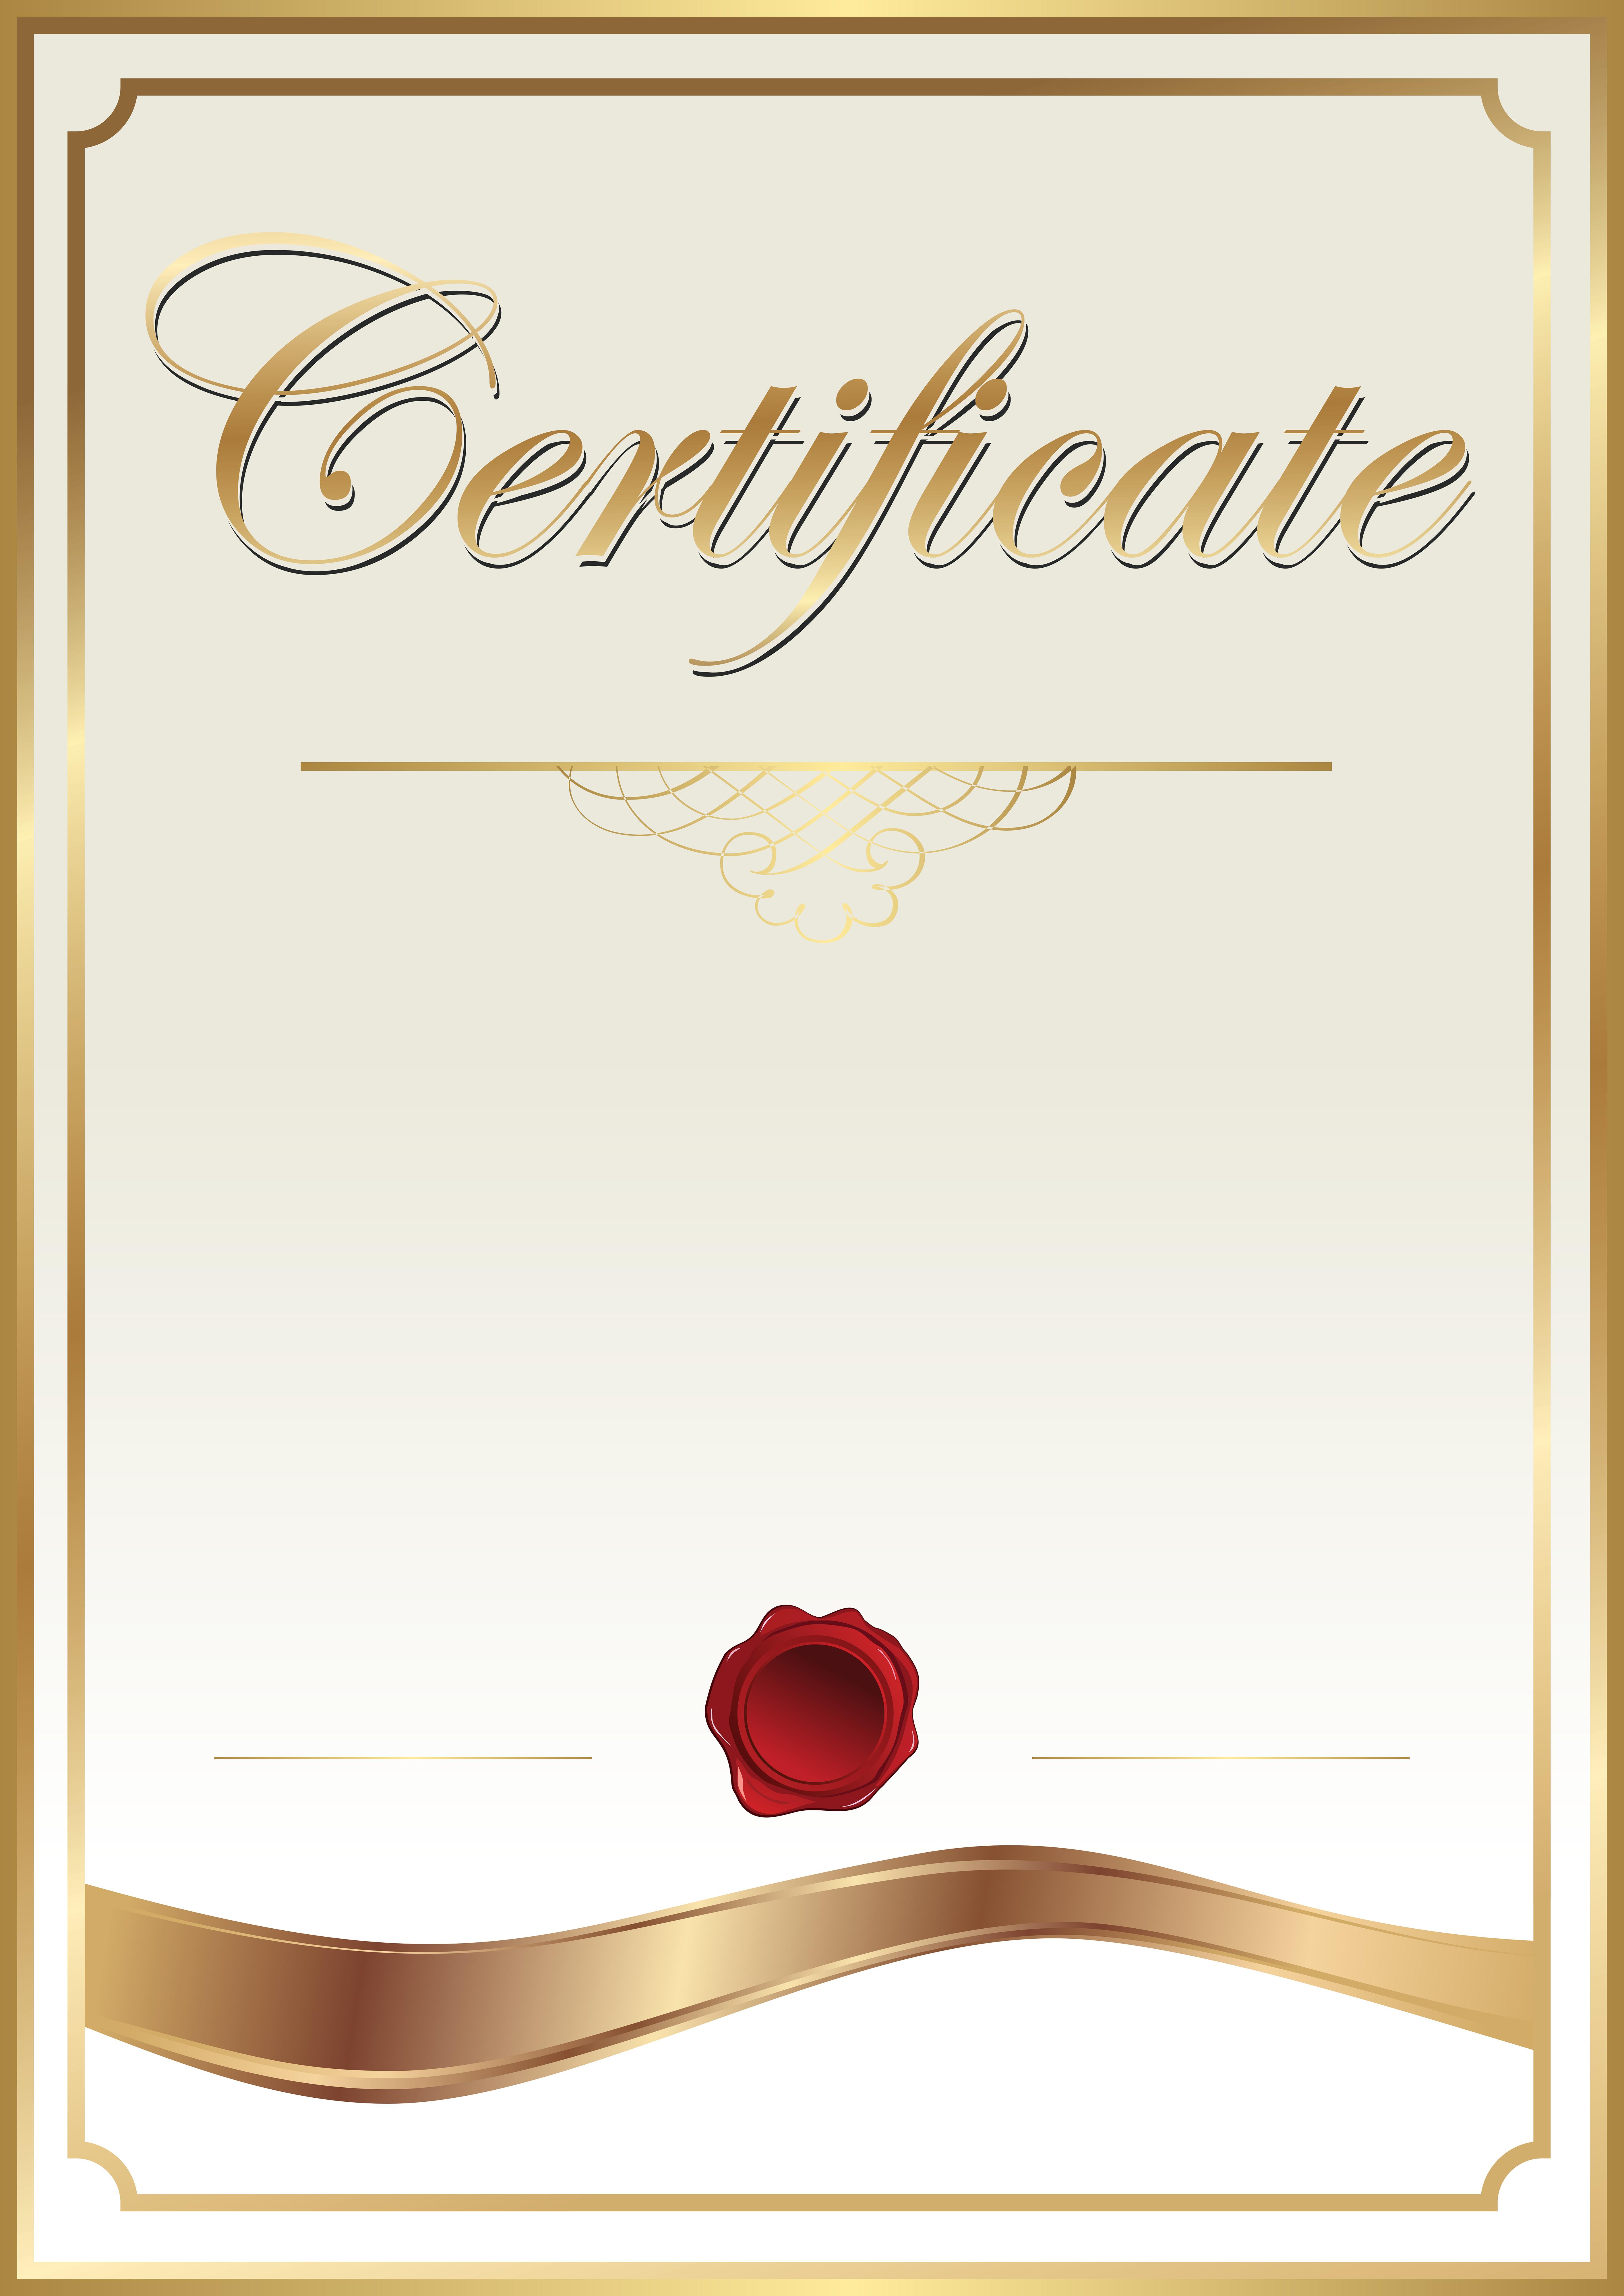 png transparent Template clip art png. Certificate clipart.